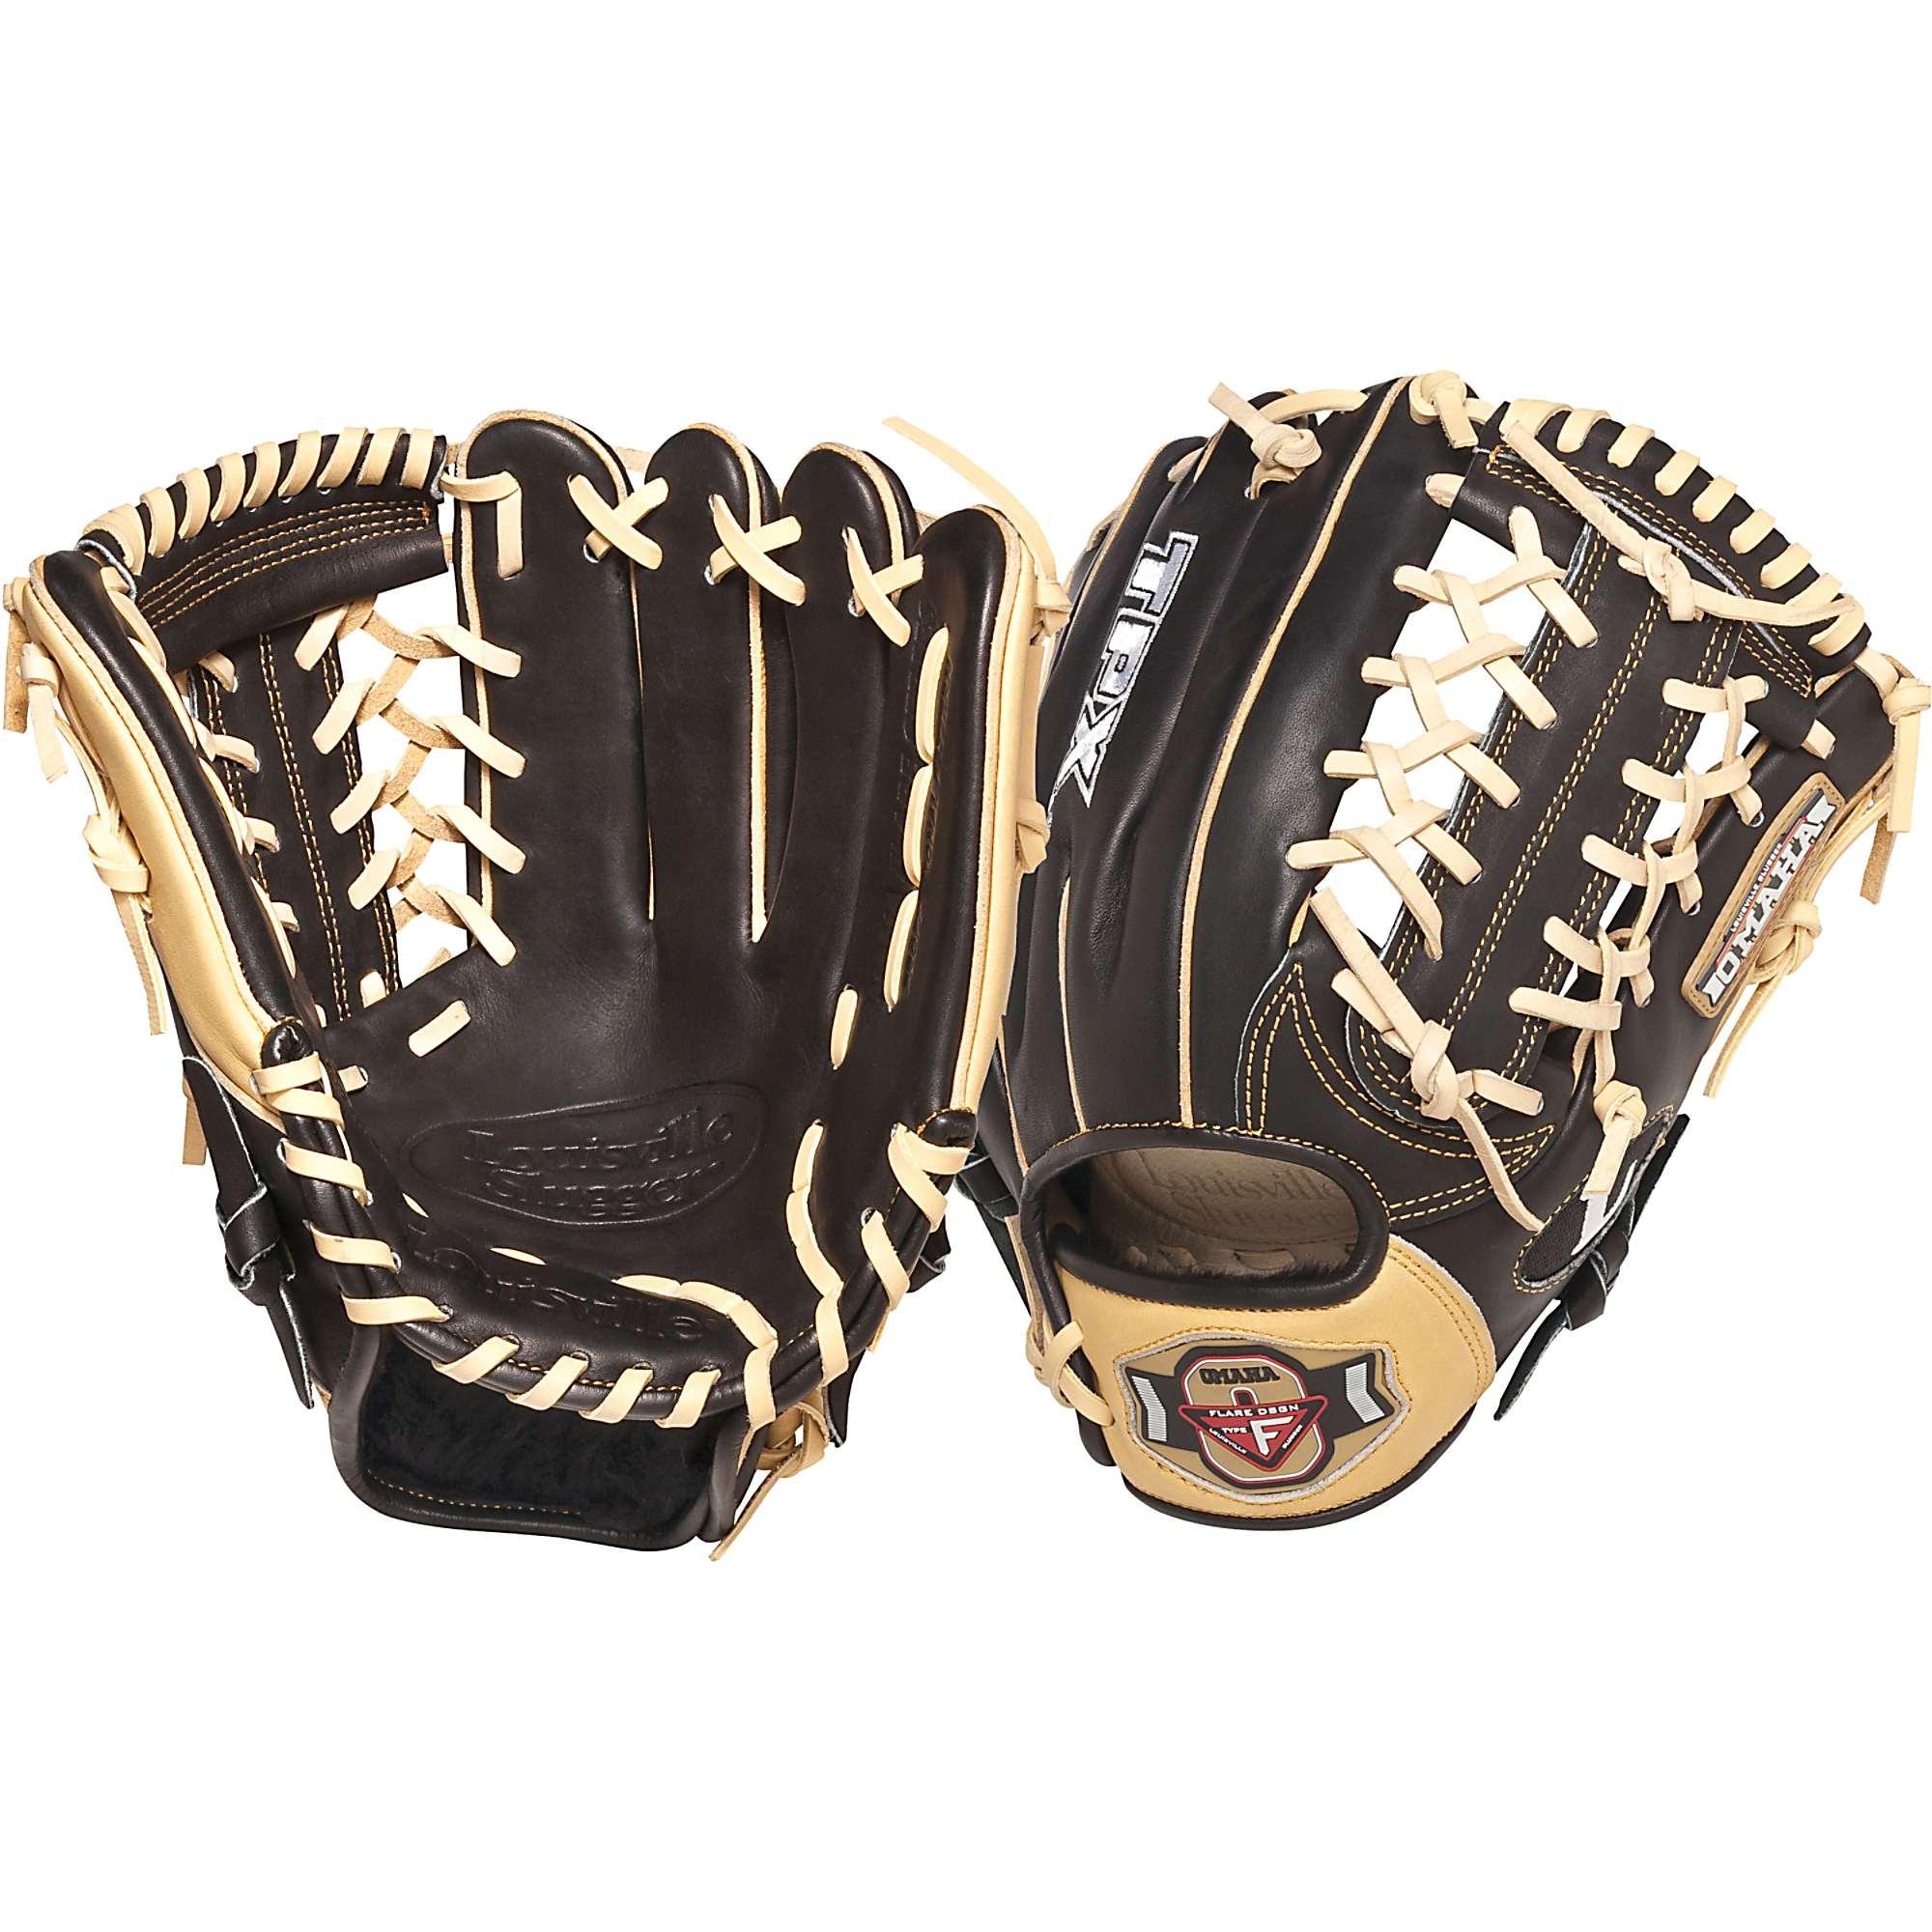 Louisville Flare Outfield Glove : Louisville slugger omaha flare quot baseball glove ebay